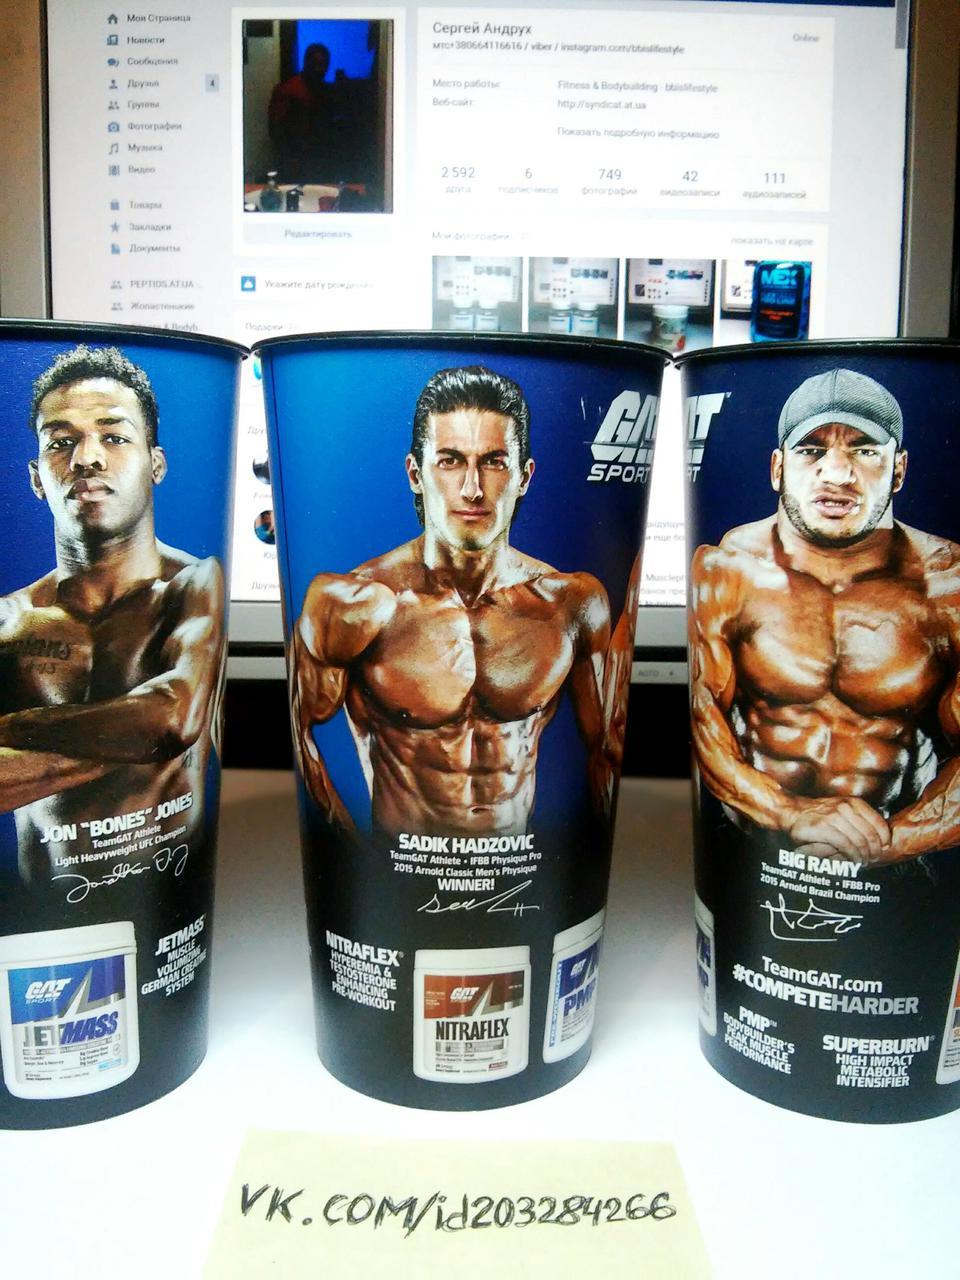 GAT Nutrition USA Staduim Cups